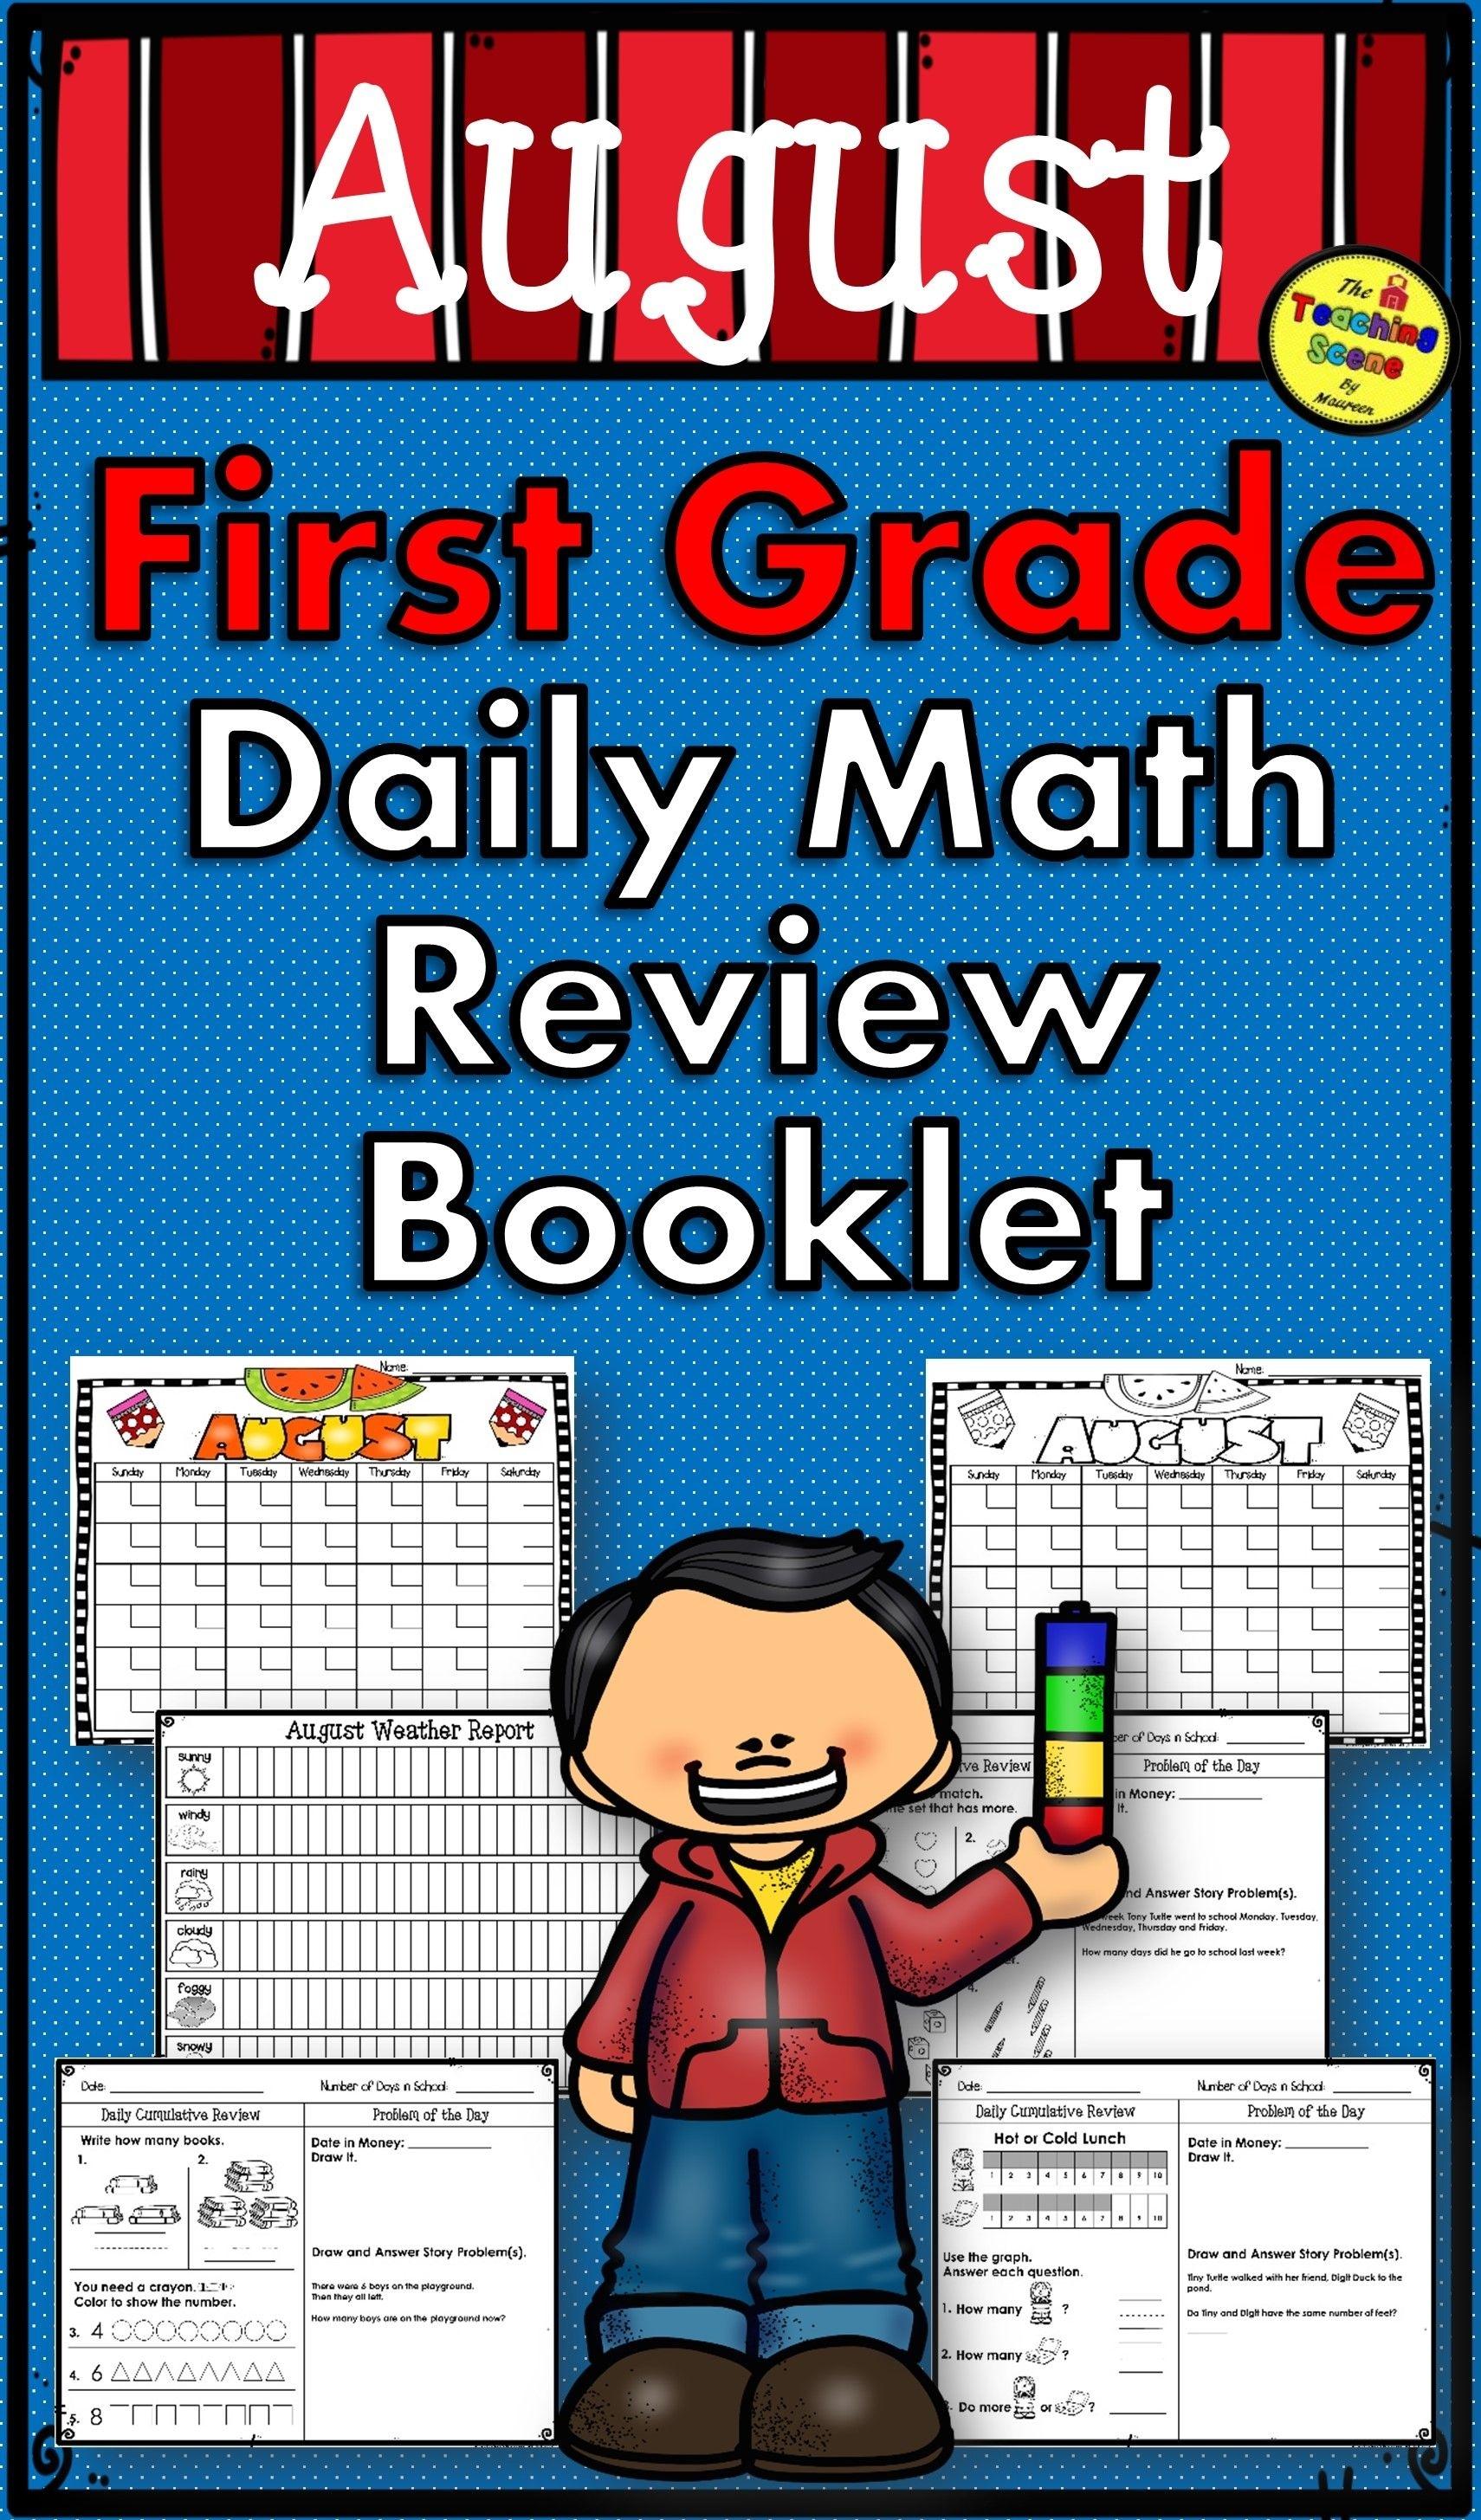 First Grade Daily Calendar & Math Review Booklet: August